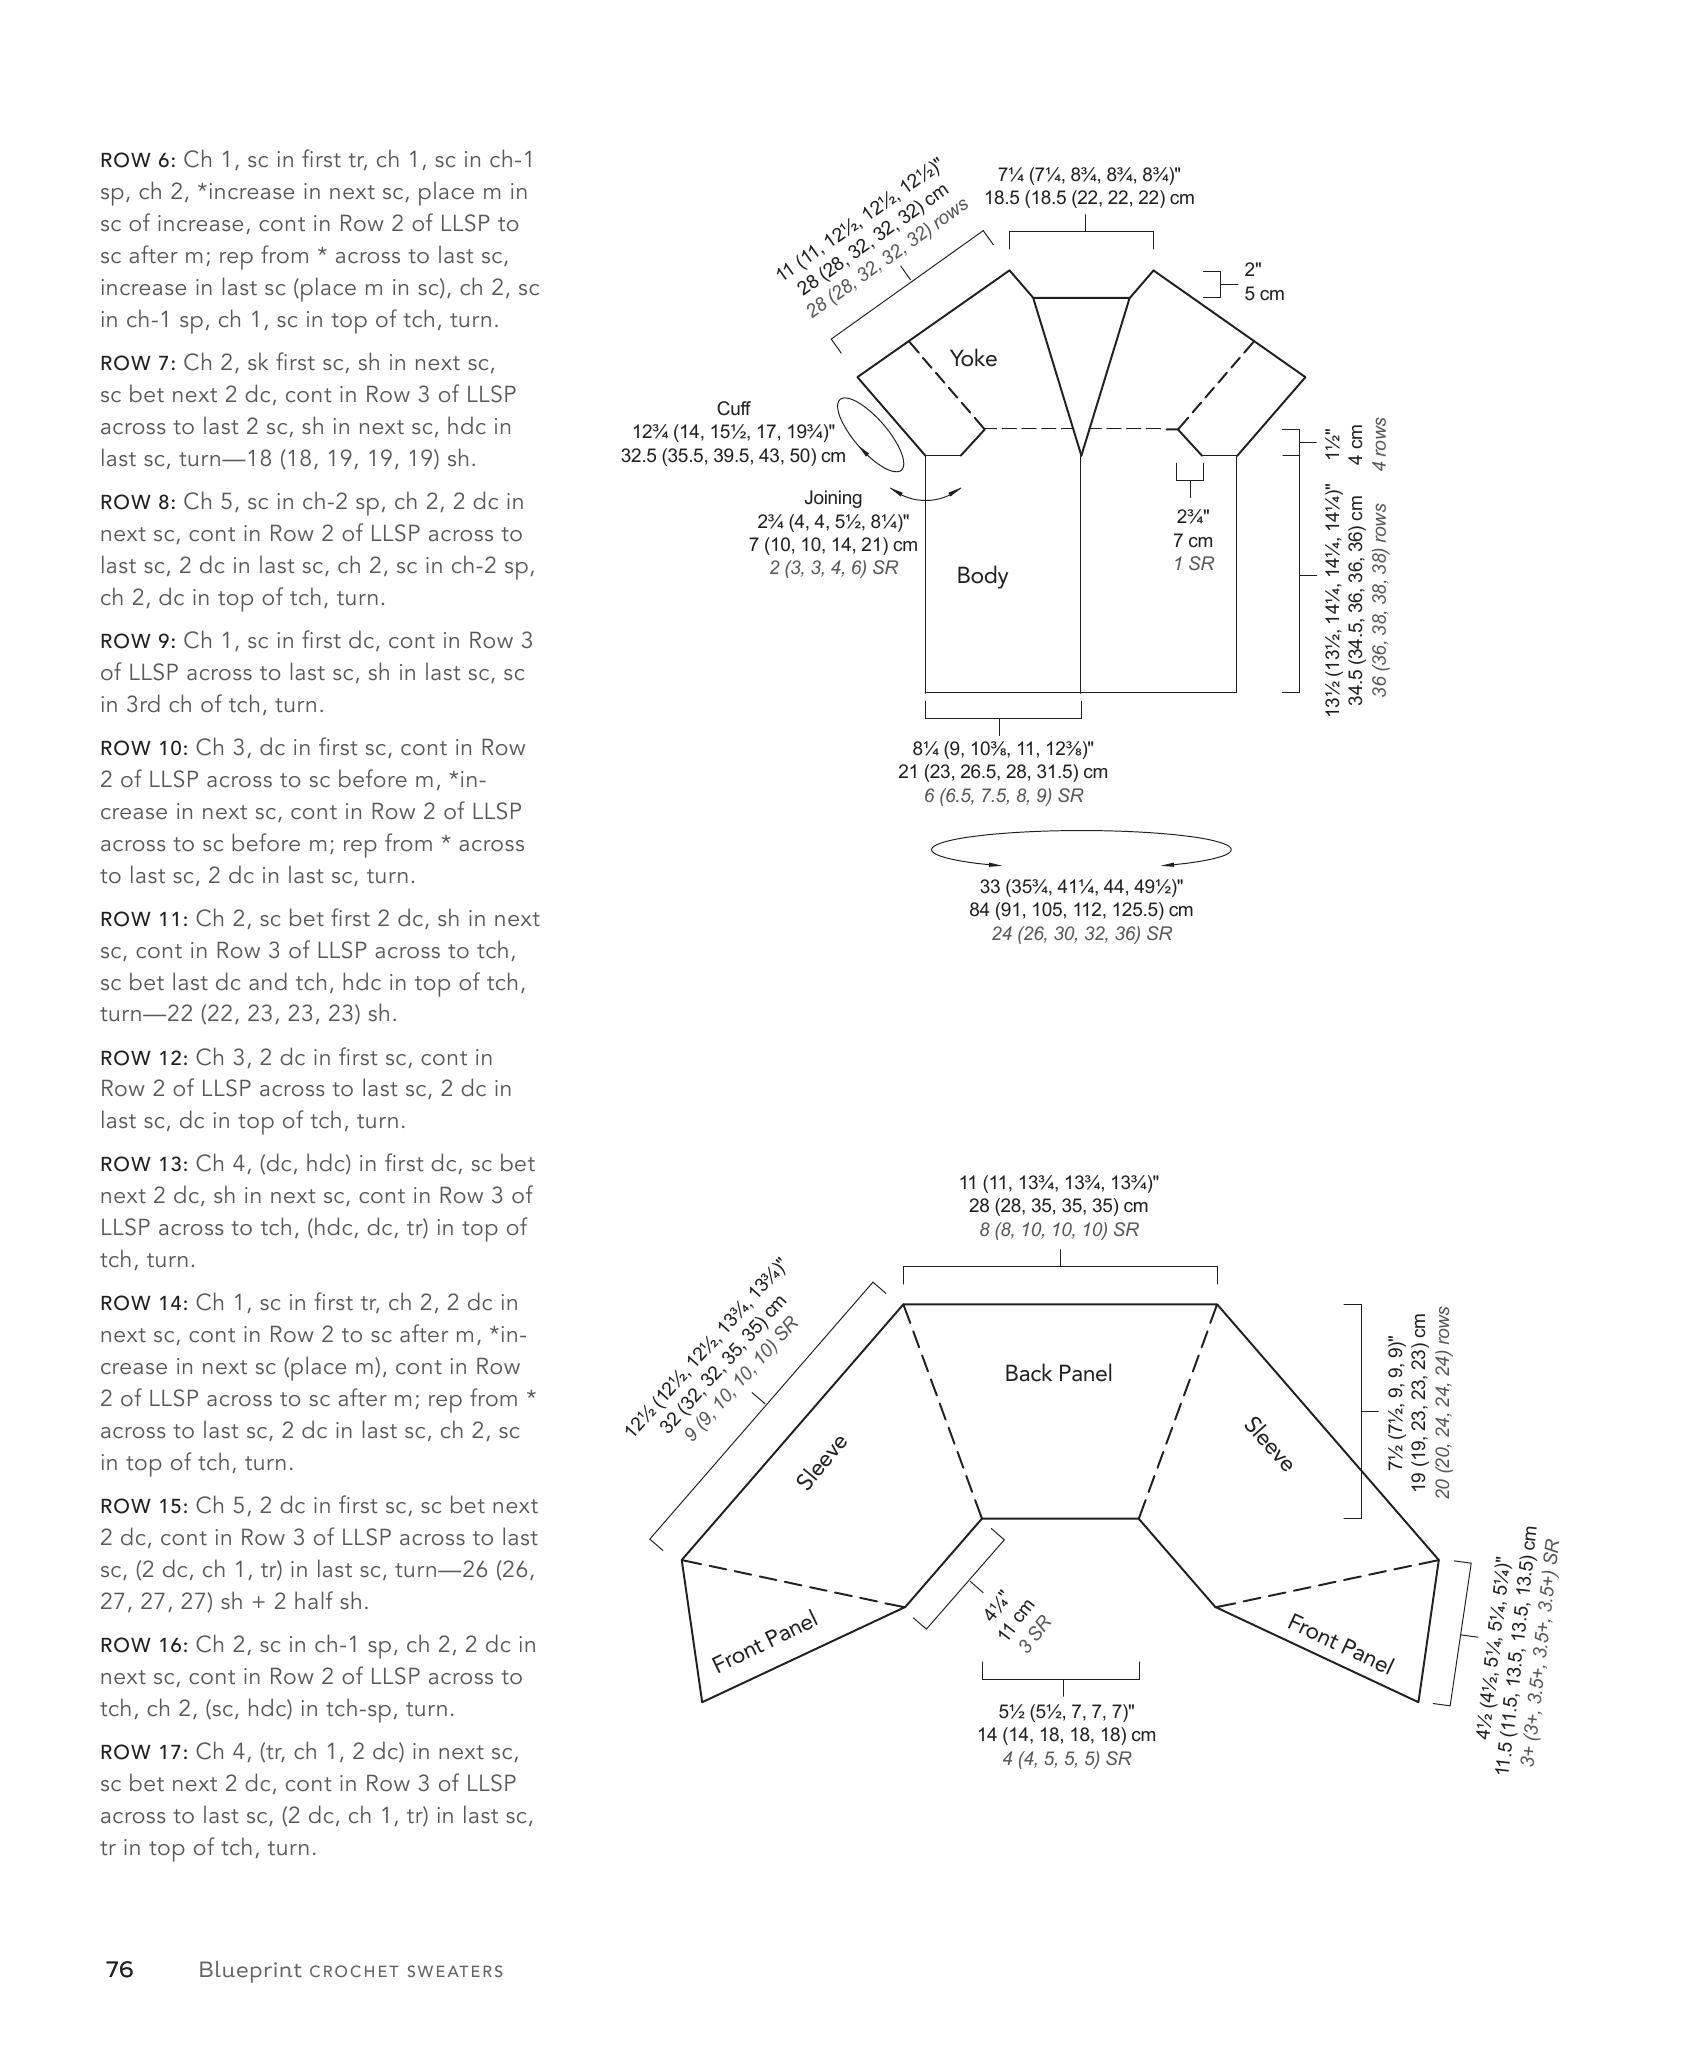 1642_Blueprint Crochet Sweaters_77 (3)